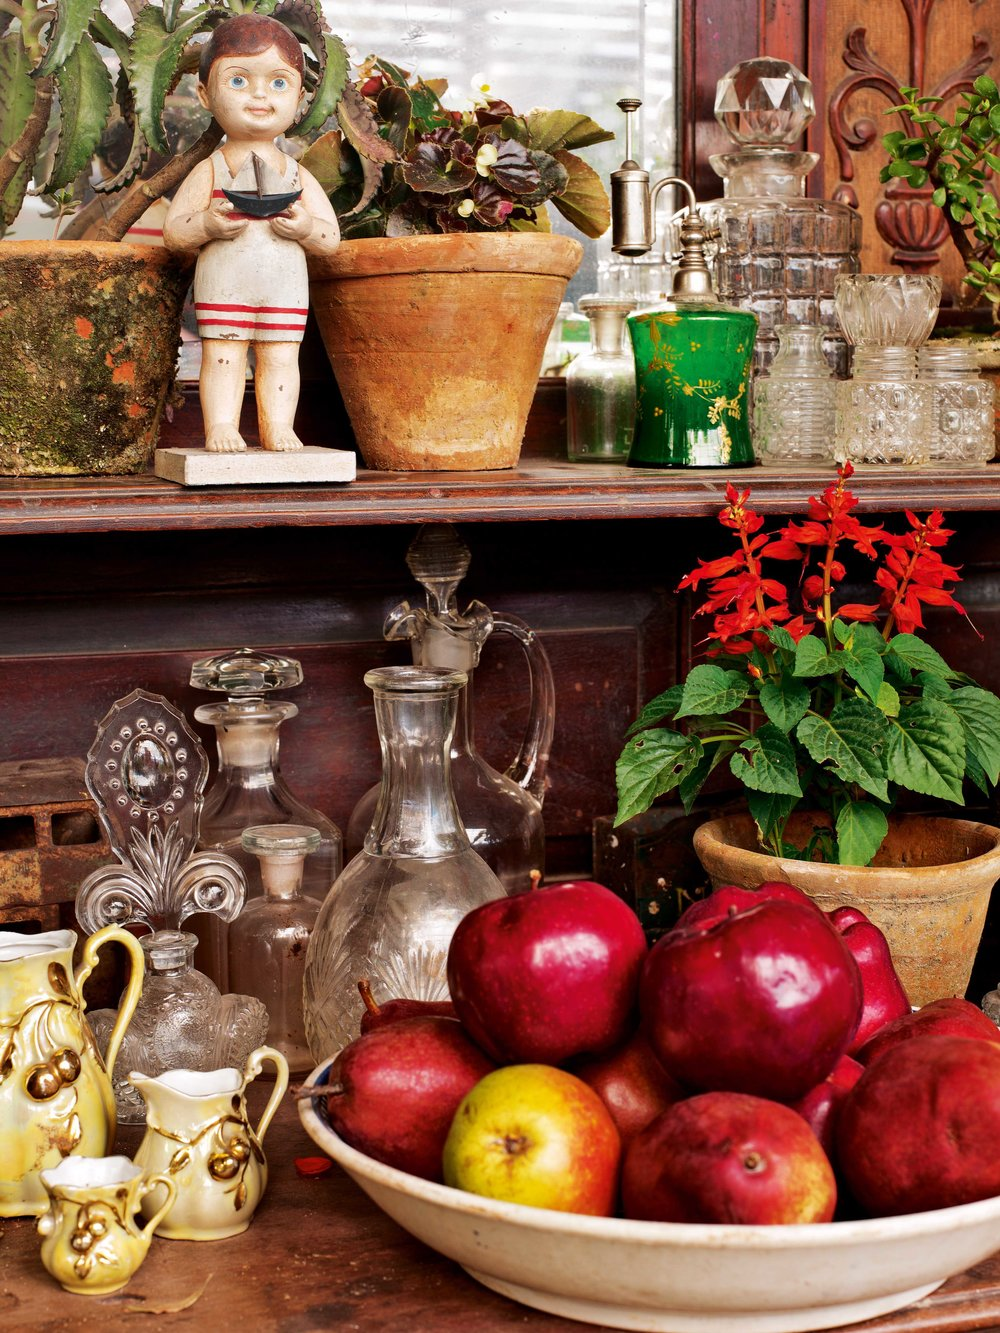 Object, curios and memorabilia in one corner of Mukherjee's terrace garden.